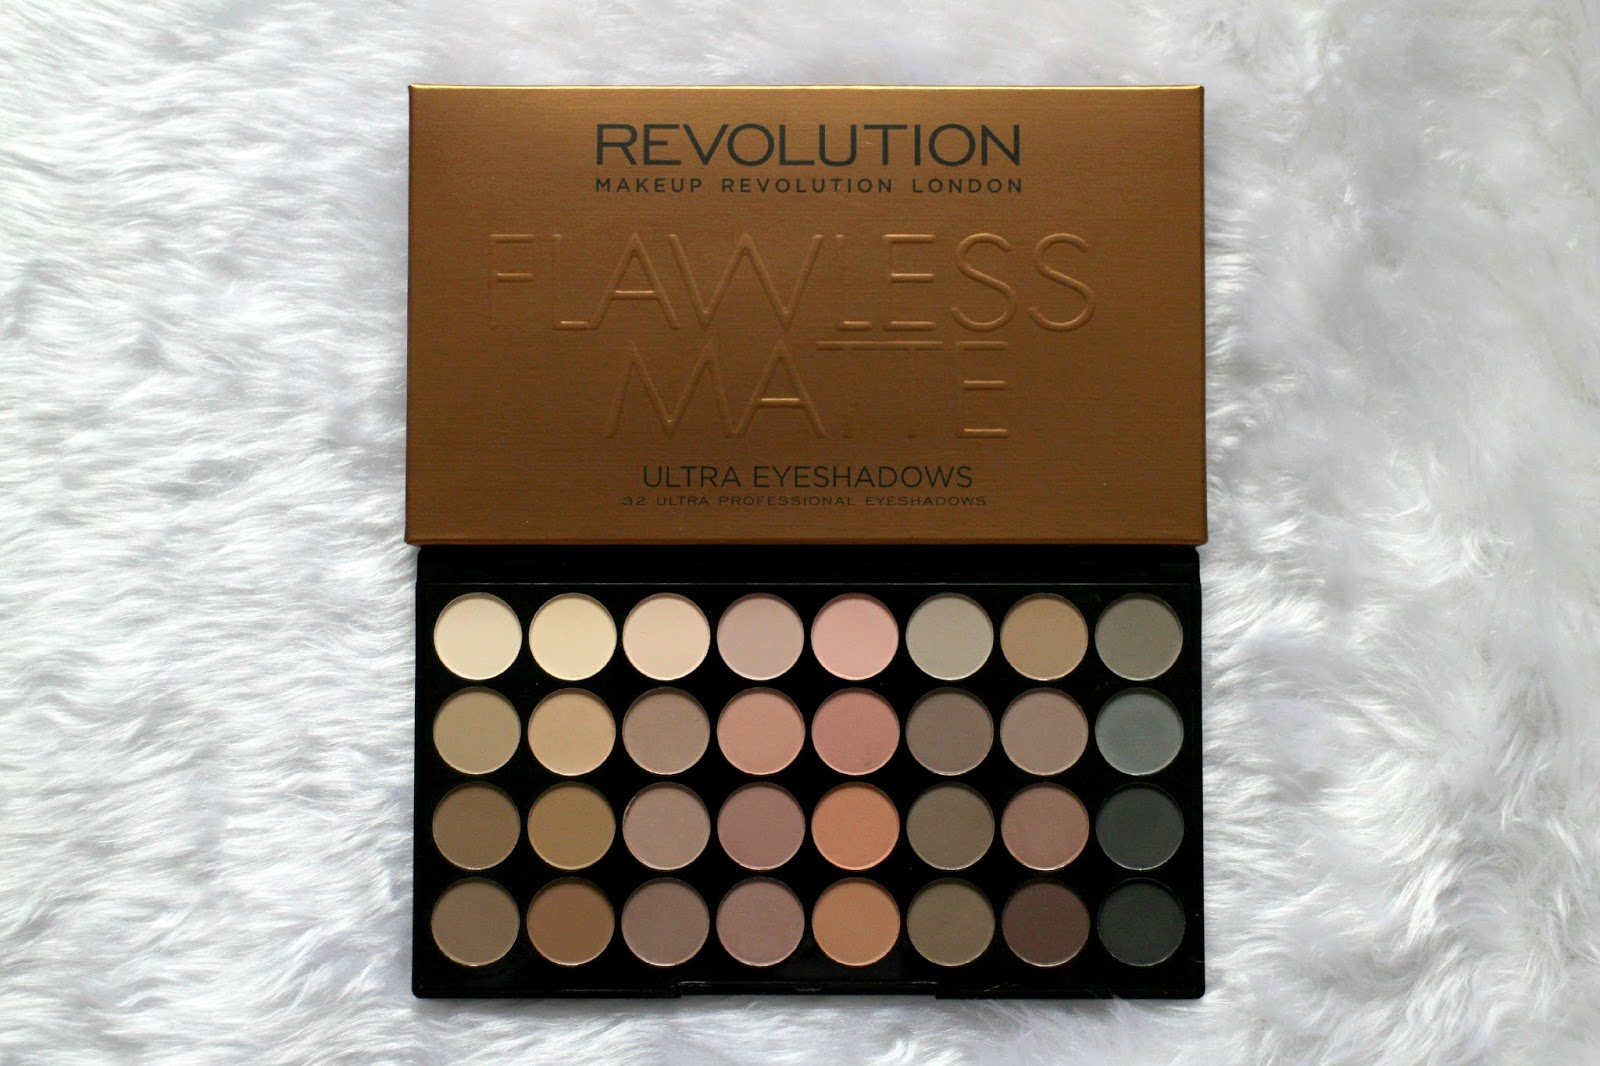 Makeup revolution london flawless matte